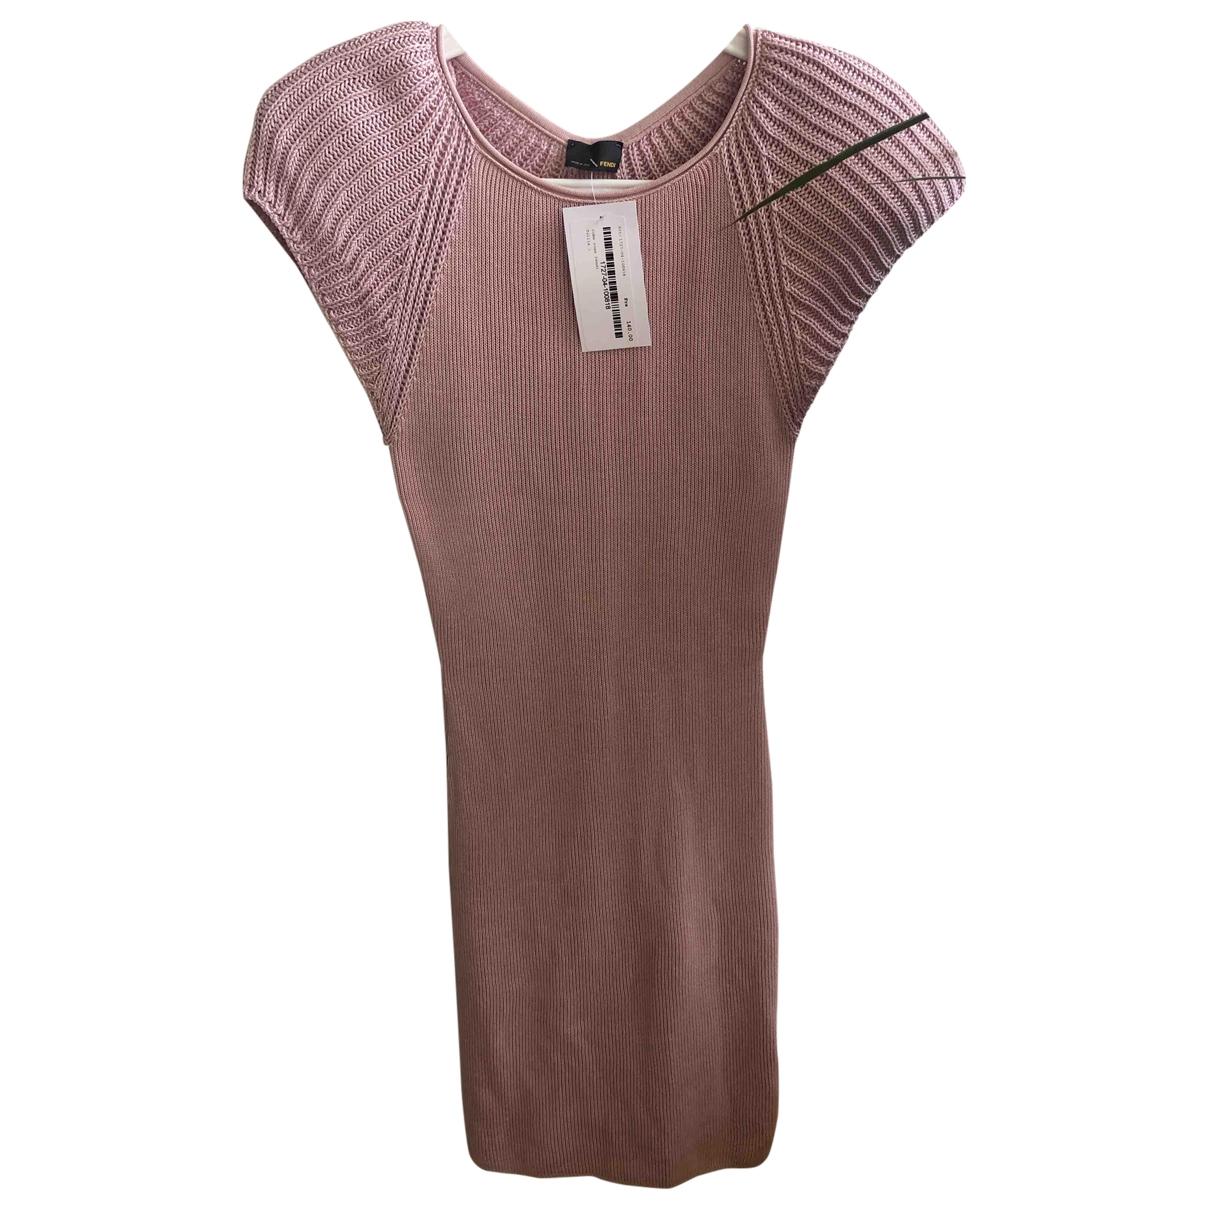 Fendi \N Pink Cotton dress for Women 38 FR